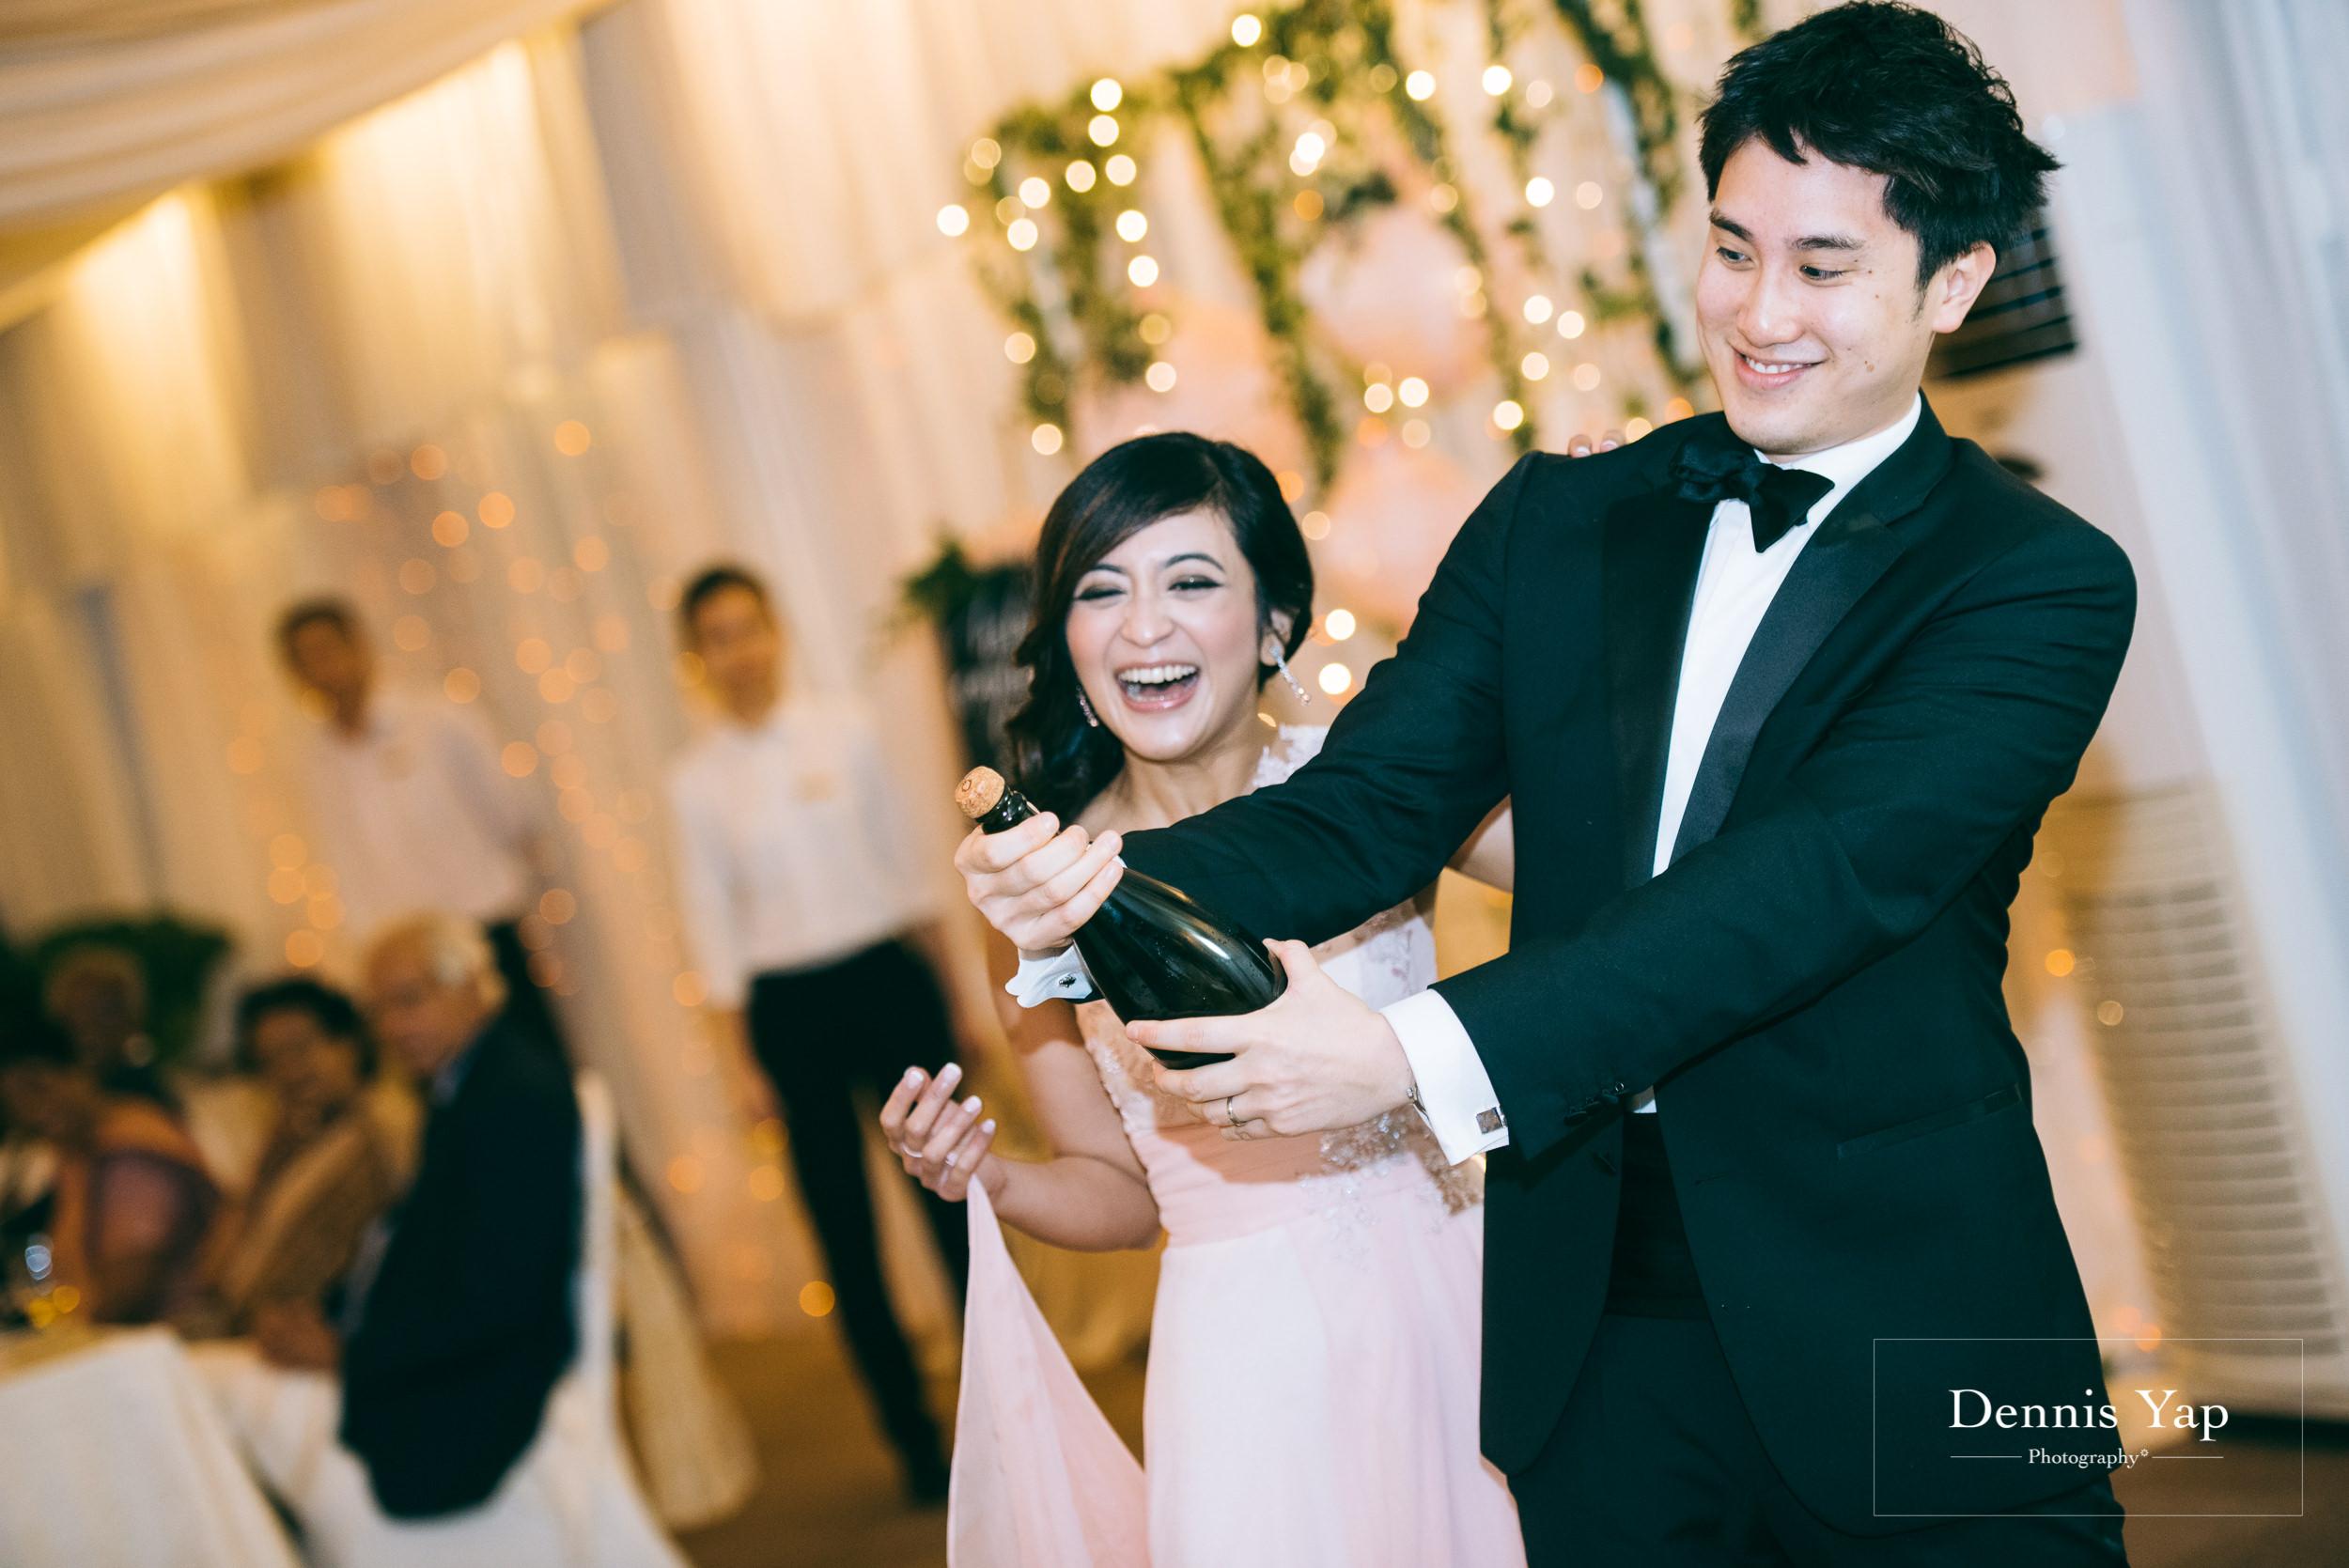 shalini yelitte wedding dinner rasa sayang resort penang dennis yap photography malaysia top wedding photographer beloved emotions flow -29.jpg